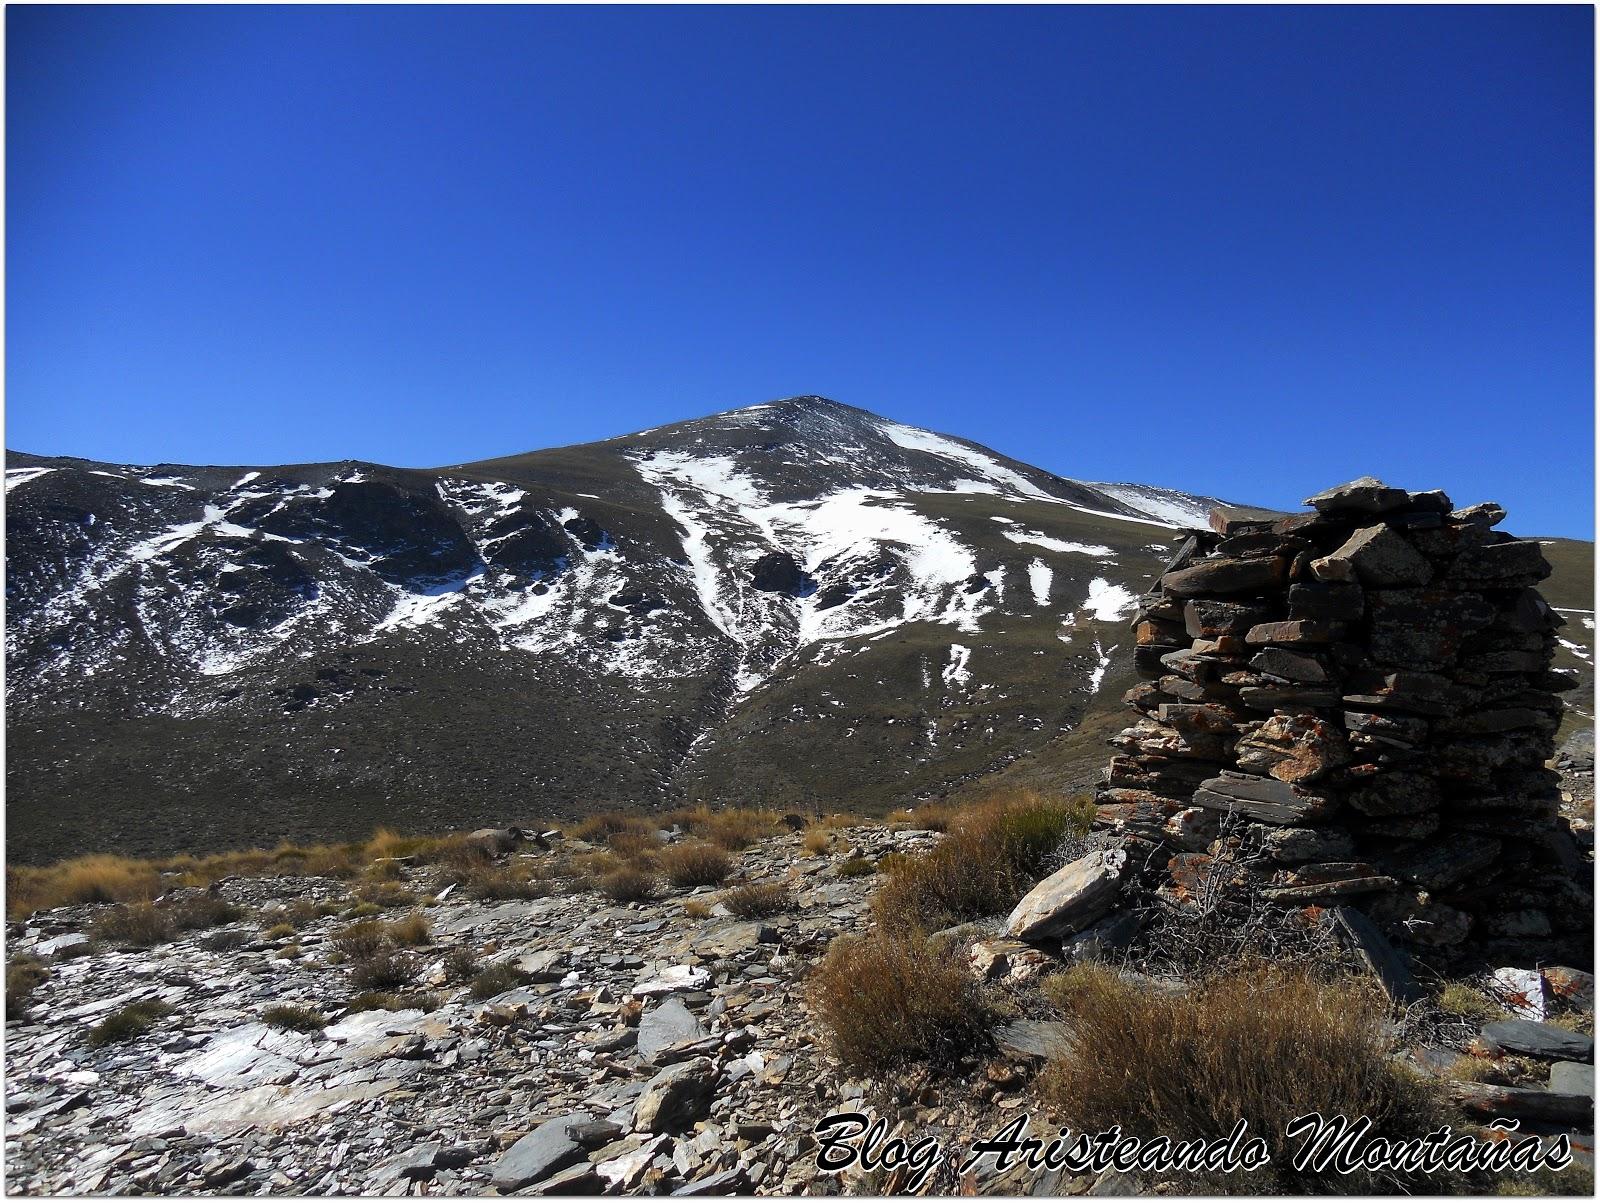 Aristeando monta as ascensi n al alto de san juan - Altos del toril ...